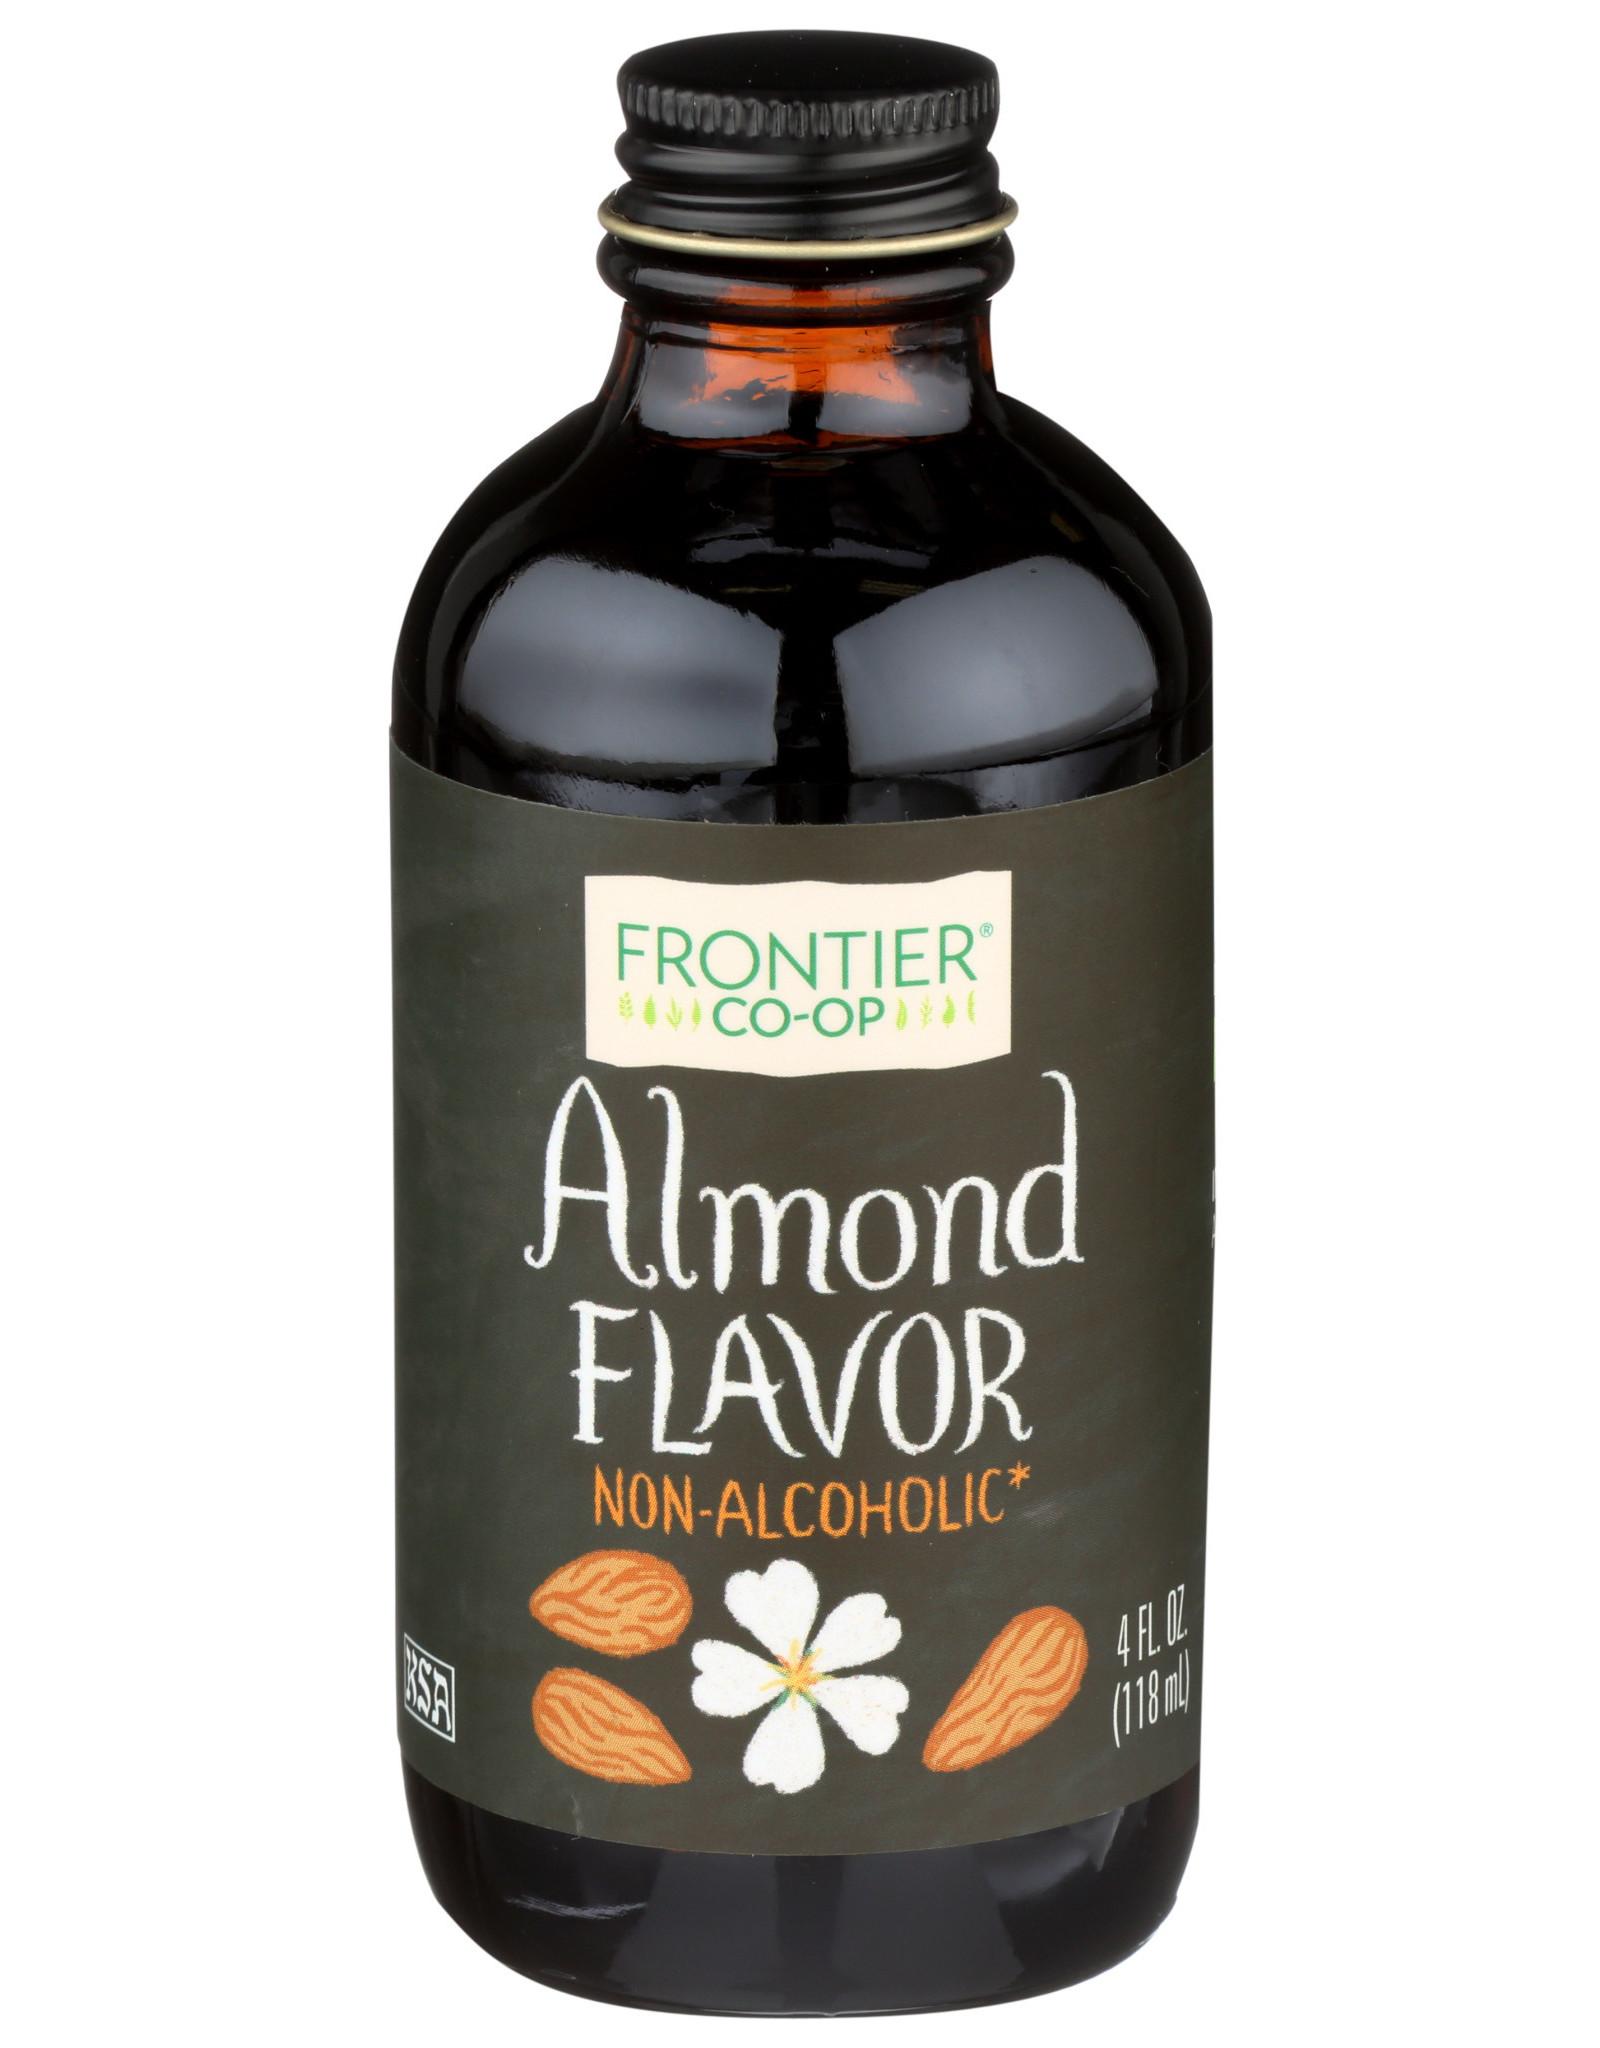 Frontier Almond Flavor 4 oz